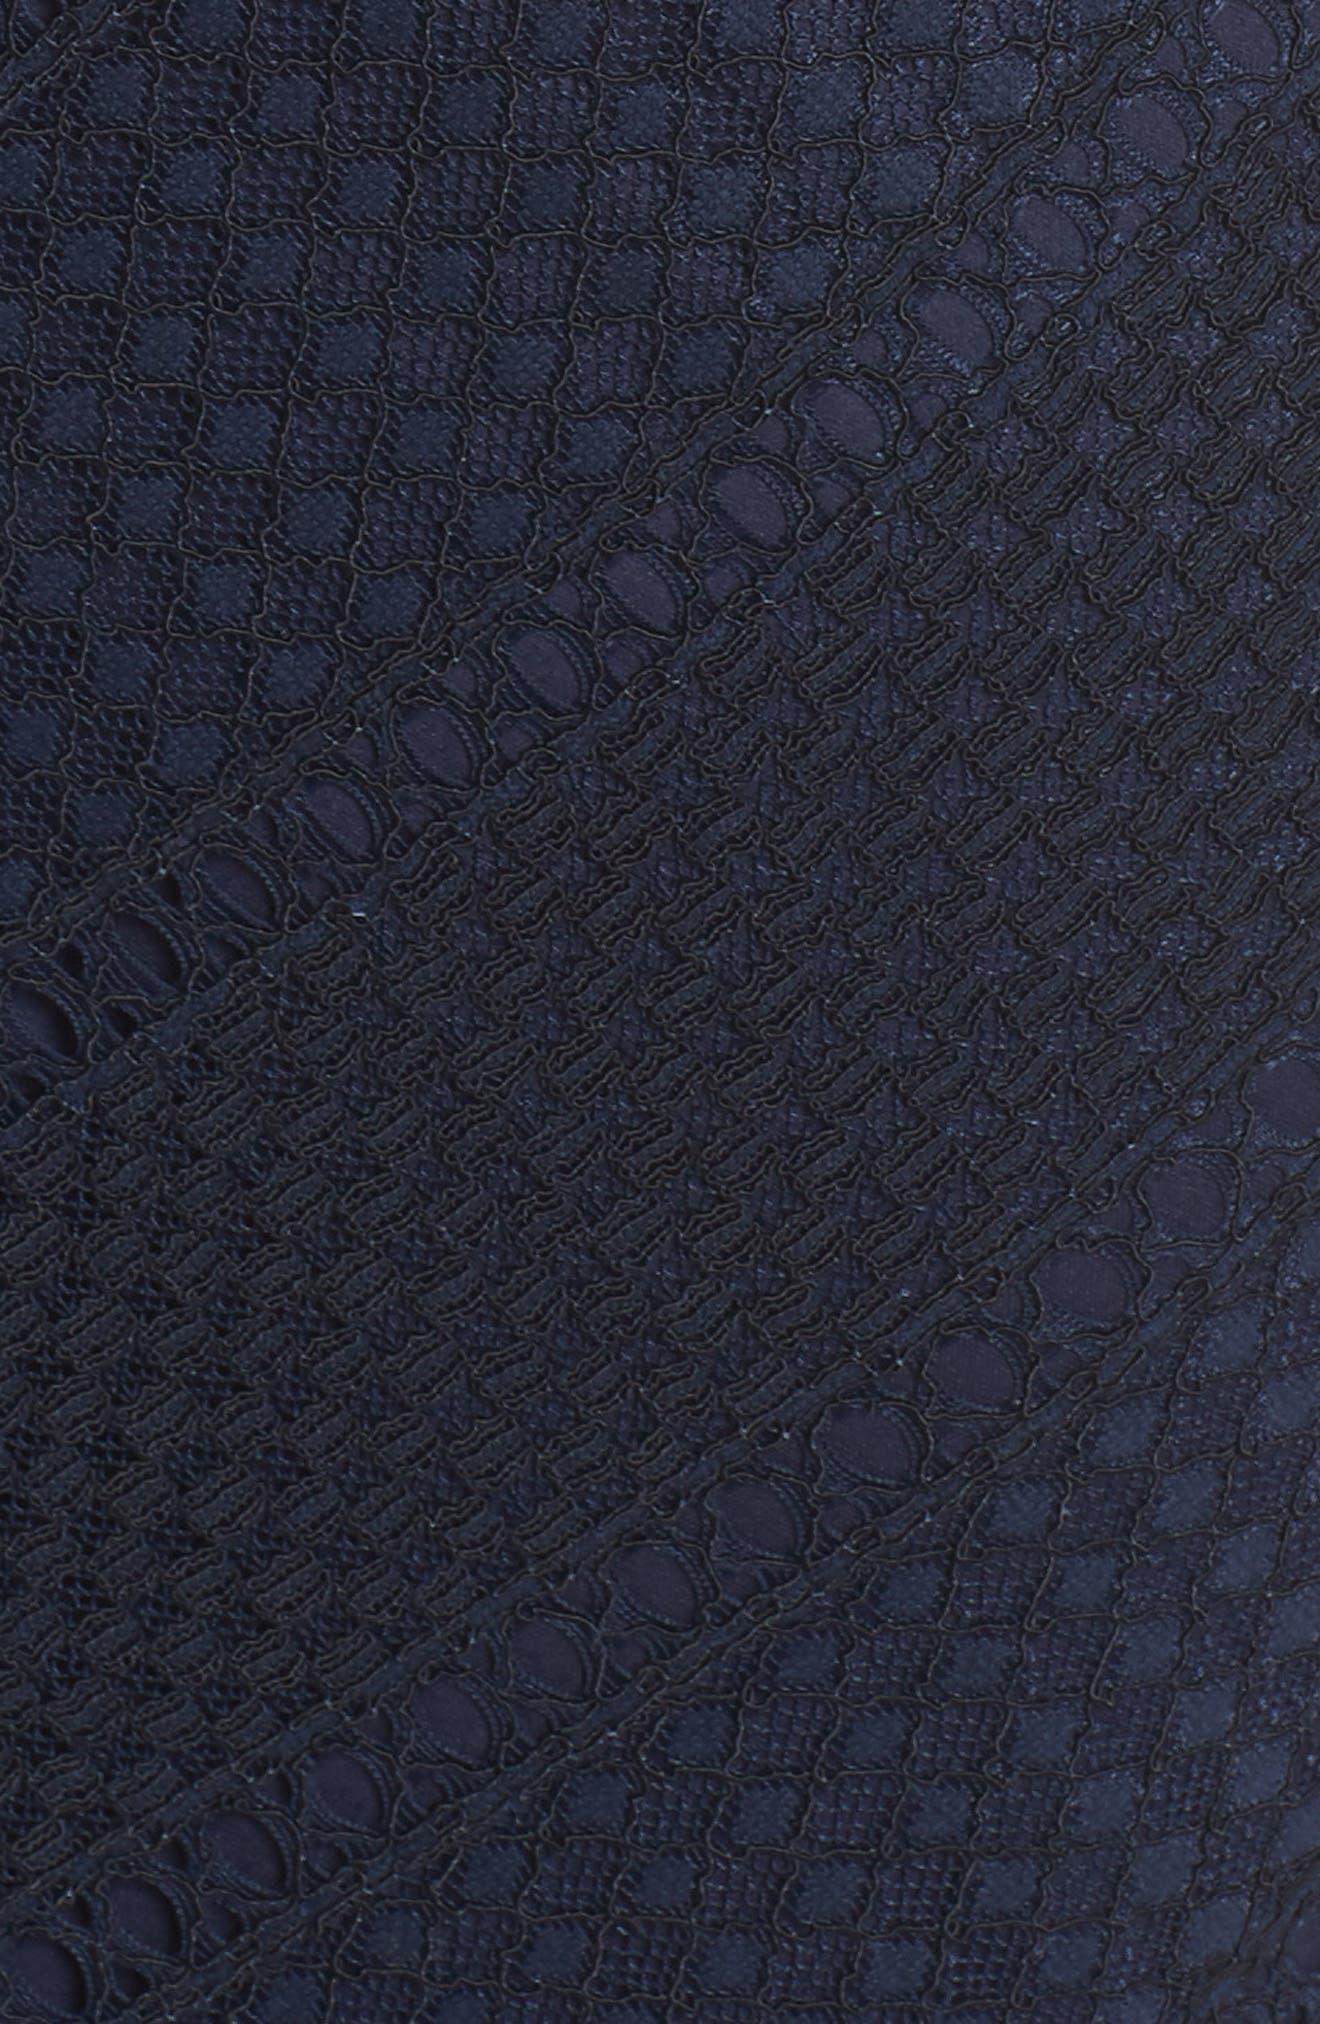 Vintage Stripe Lace Sheath Dress,                             Alternate thumbnail 6, color,                             Navy/ Black